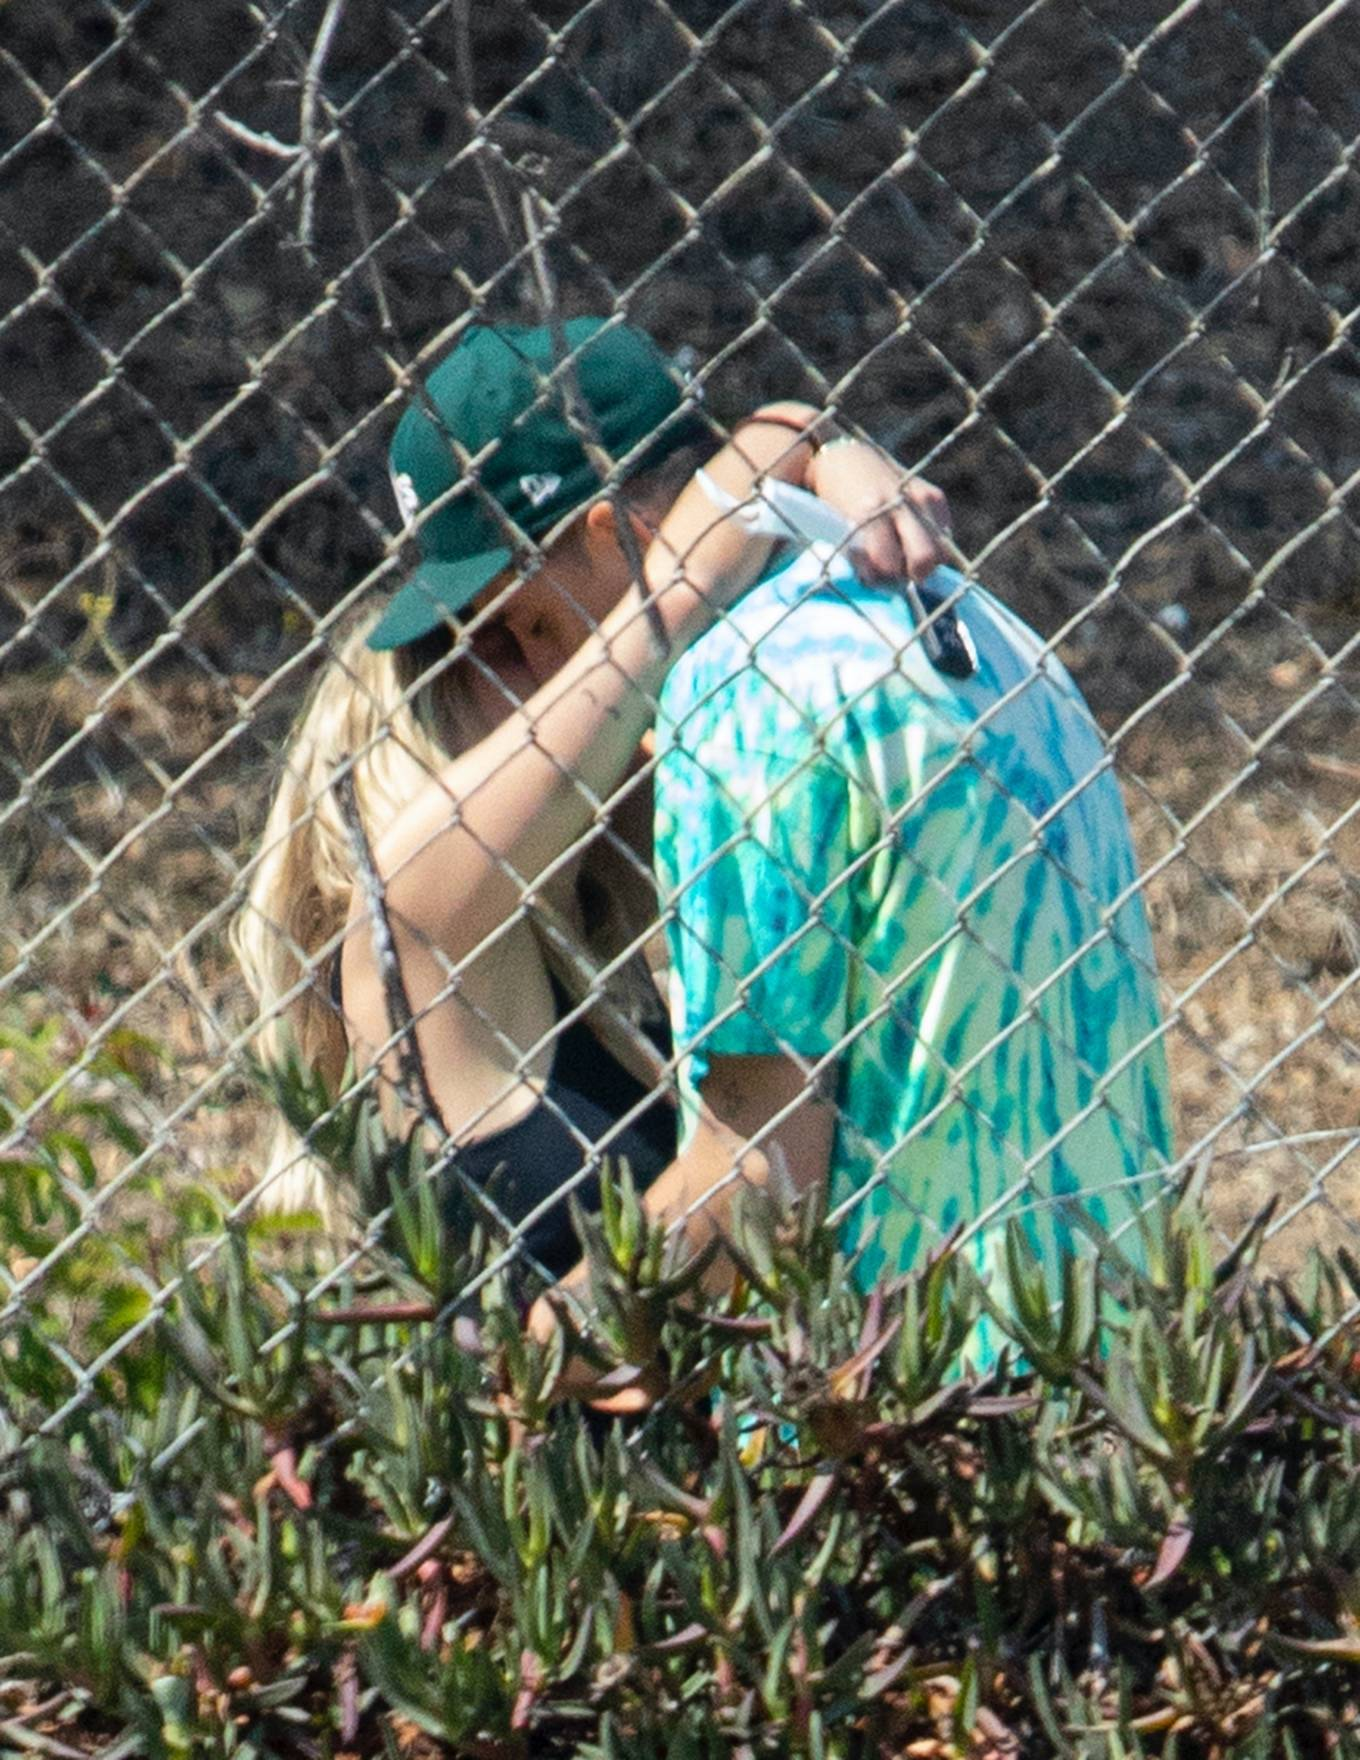 Ashley Benson 2020 : Ashley Benson and boyfriend G-Eazy as she arrives at his video shoot in Malibu-17